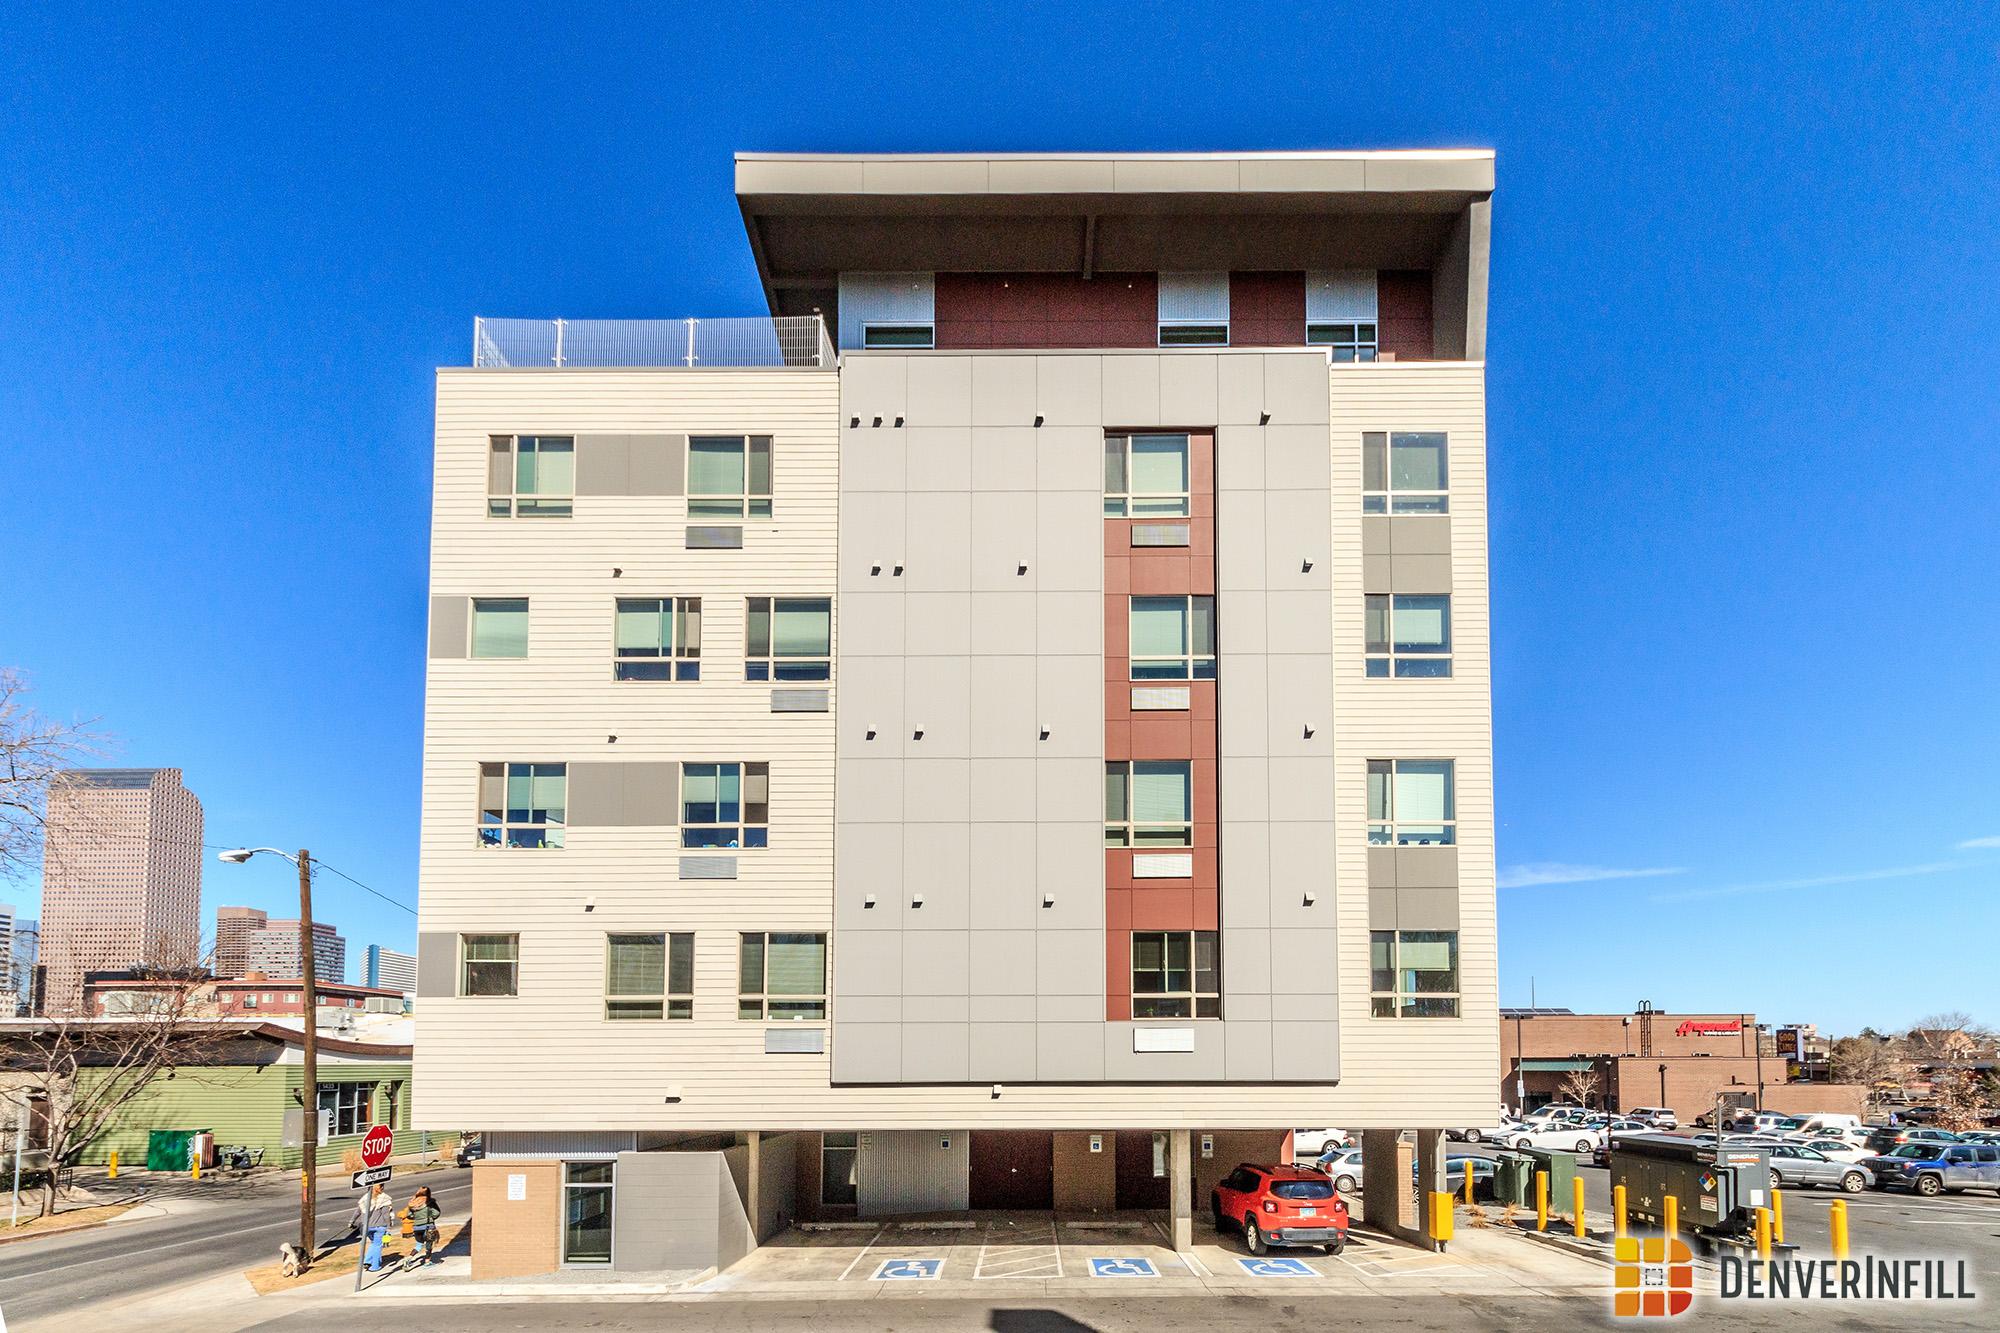 Saint Francis Apartments along Washington Street in Denver's Capitol Hill neighborhood